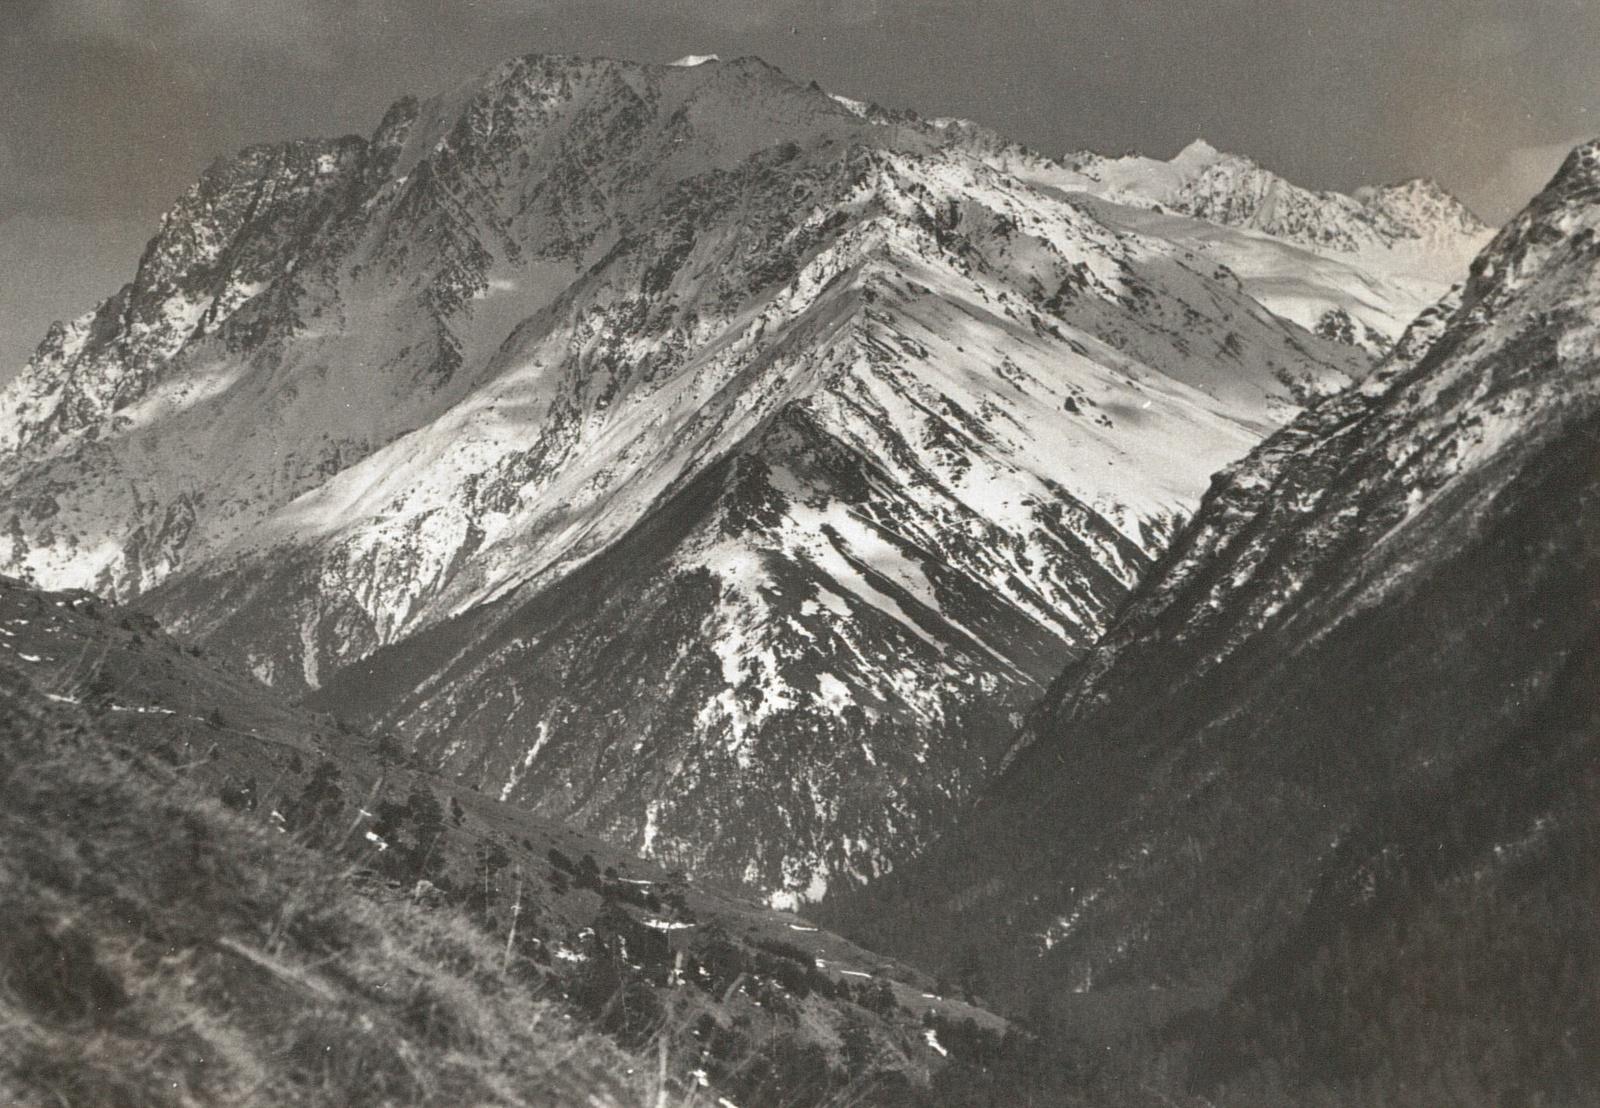 Центральный Кавказ. Андырчи  (3939 м) и Курмычи (4051 м)